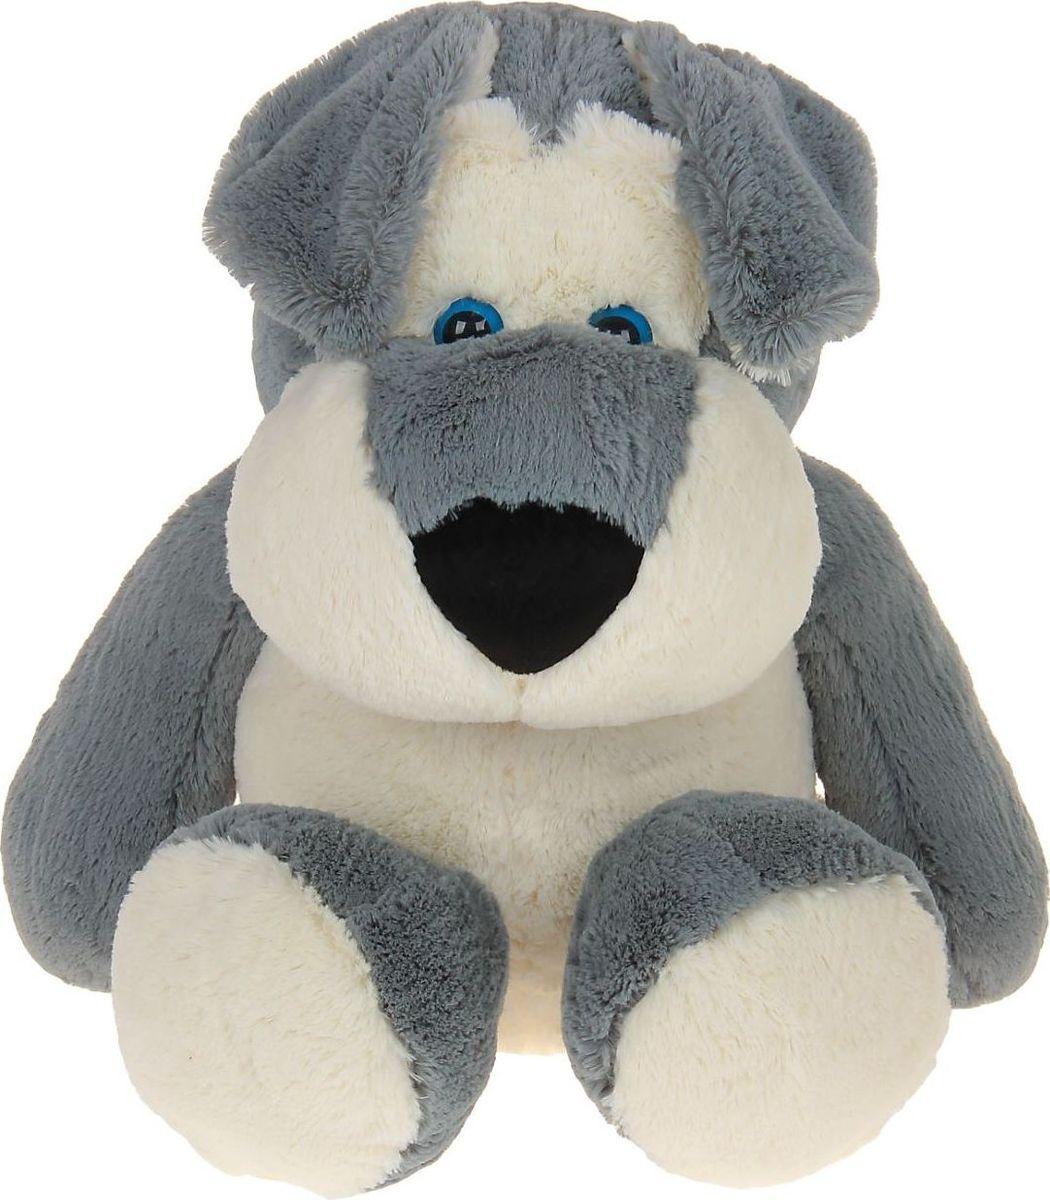 Sima-land Мягкая игрушка Собака Спайк Premium Quality цвет дымчатый 55 см радомир мягкая игрушка собака соня 55 см 2008906